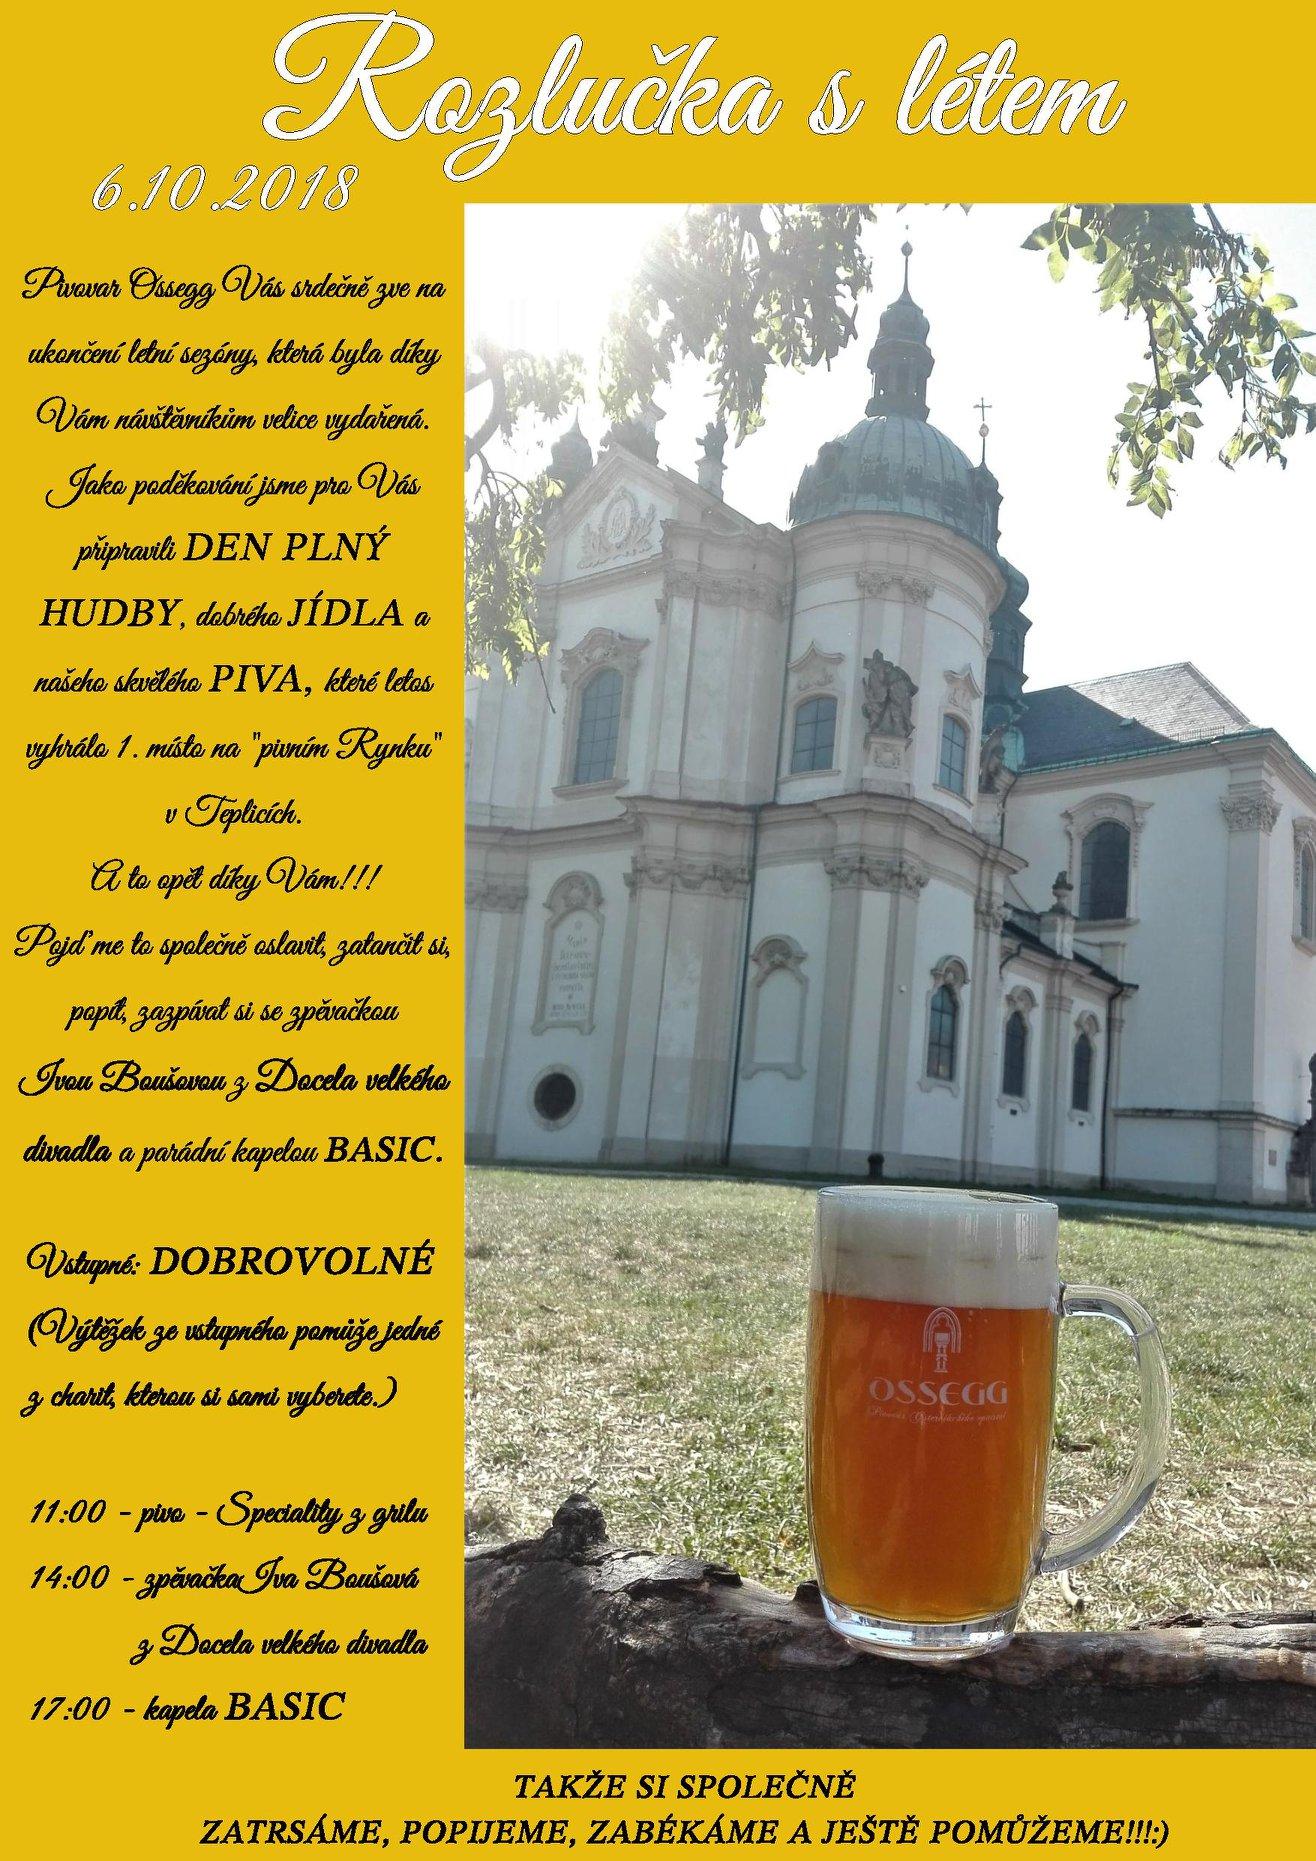 pivovari-pivovary-akce-rozlouceni-s-letem-pivovar-ossegg